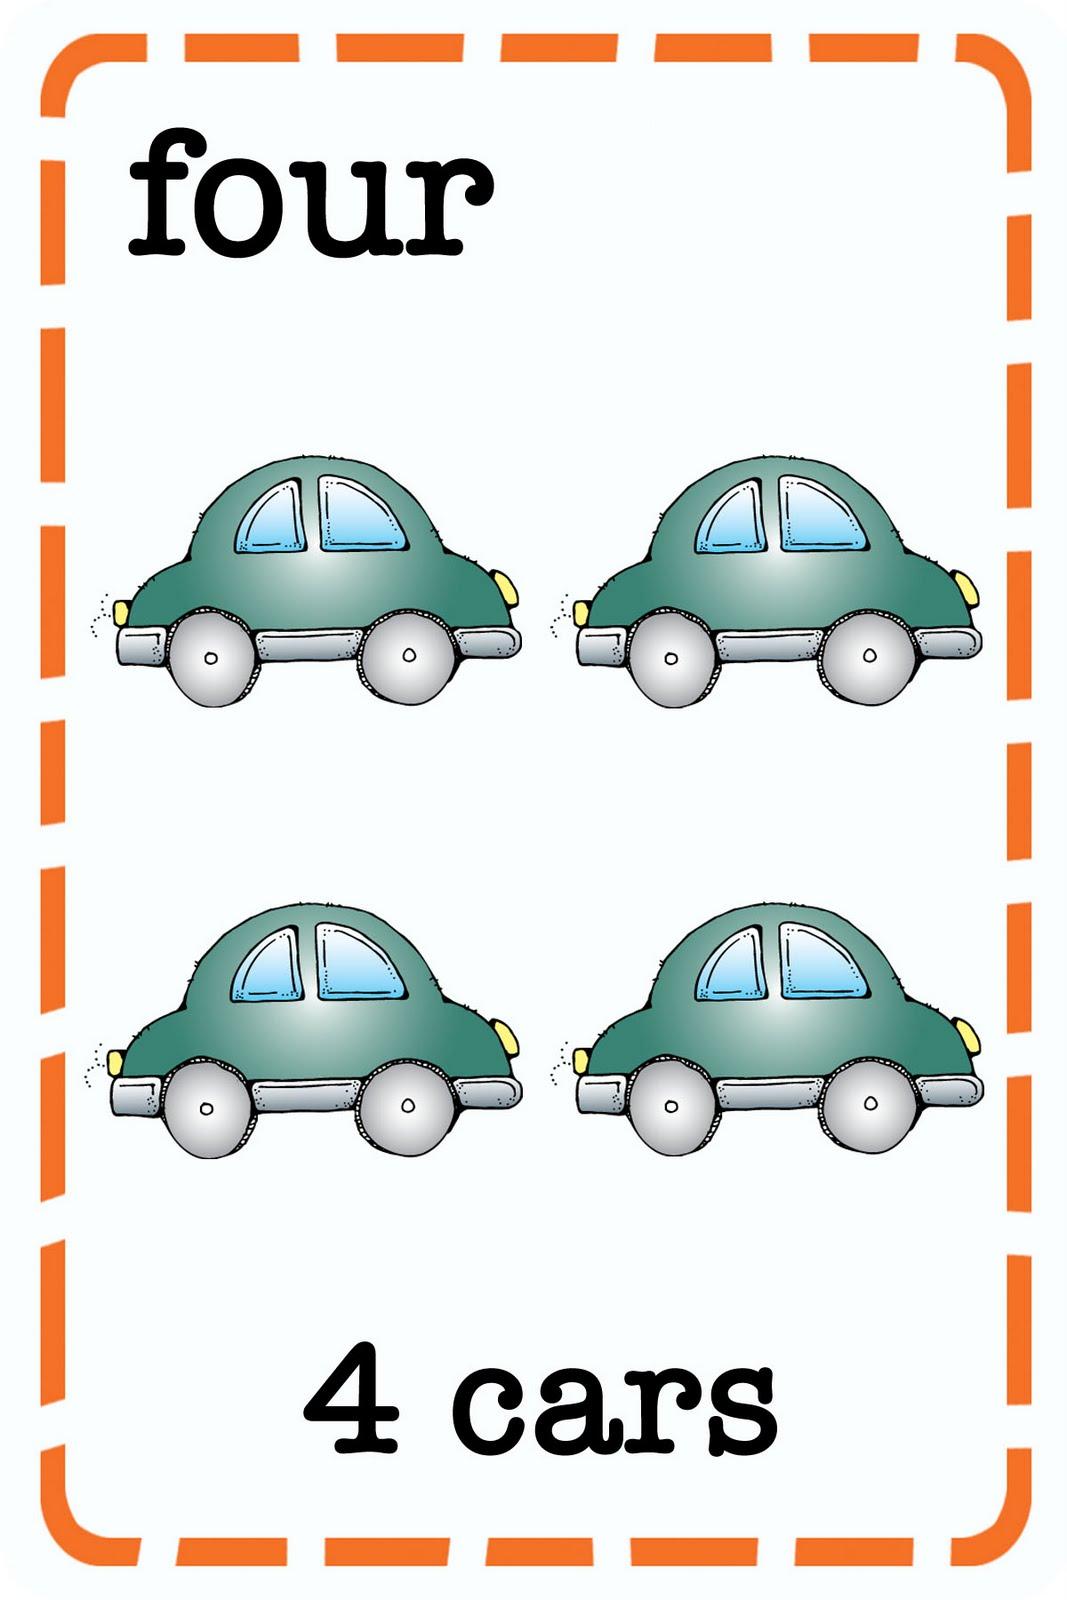 Inker Clip Art : Dj inkers car clipart suggest